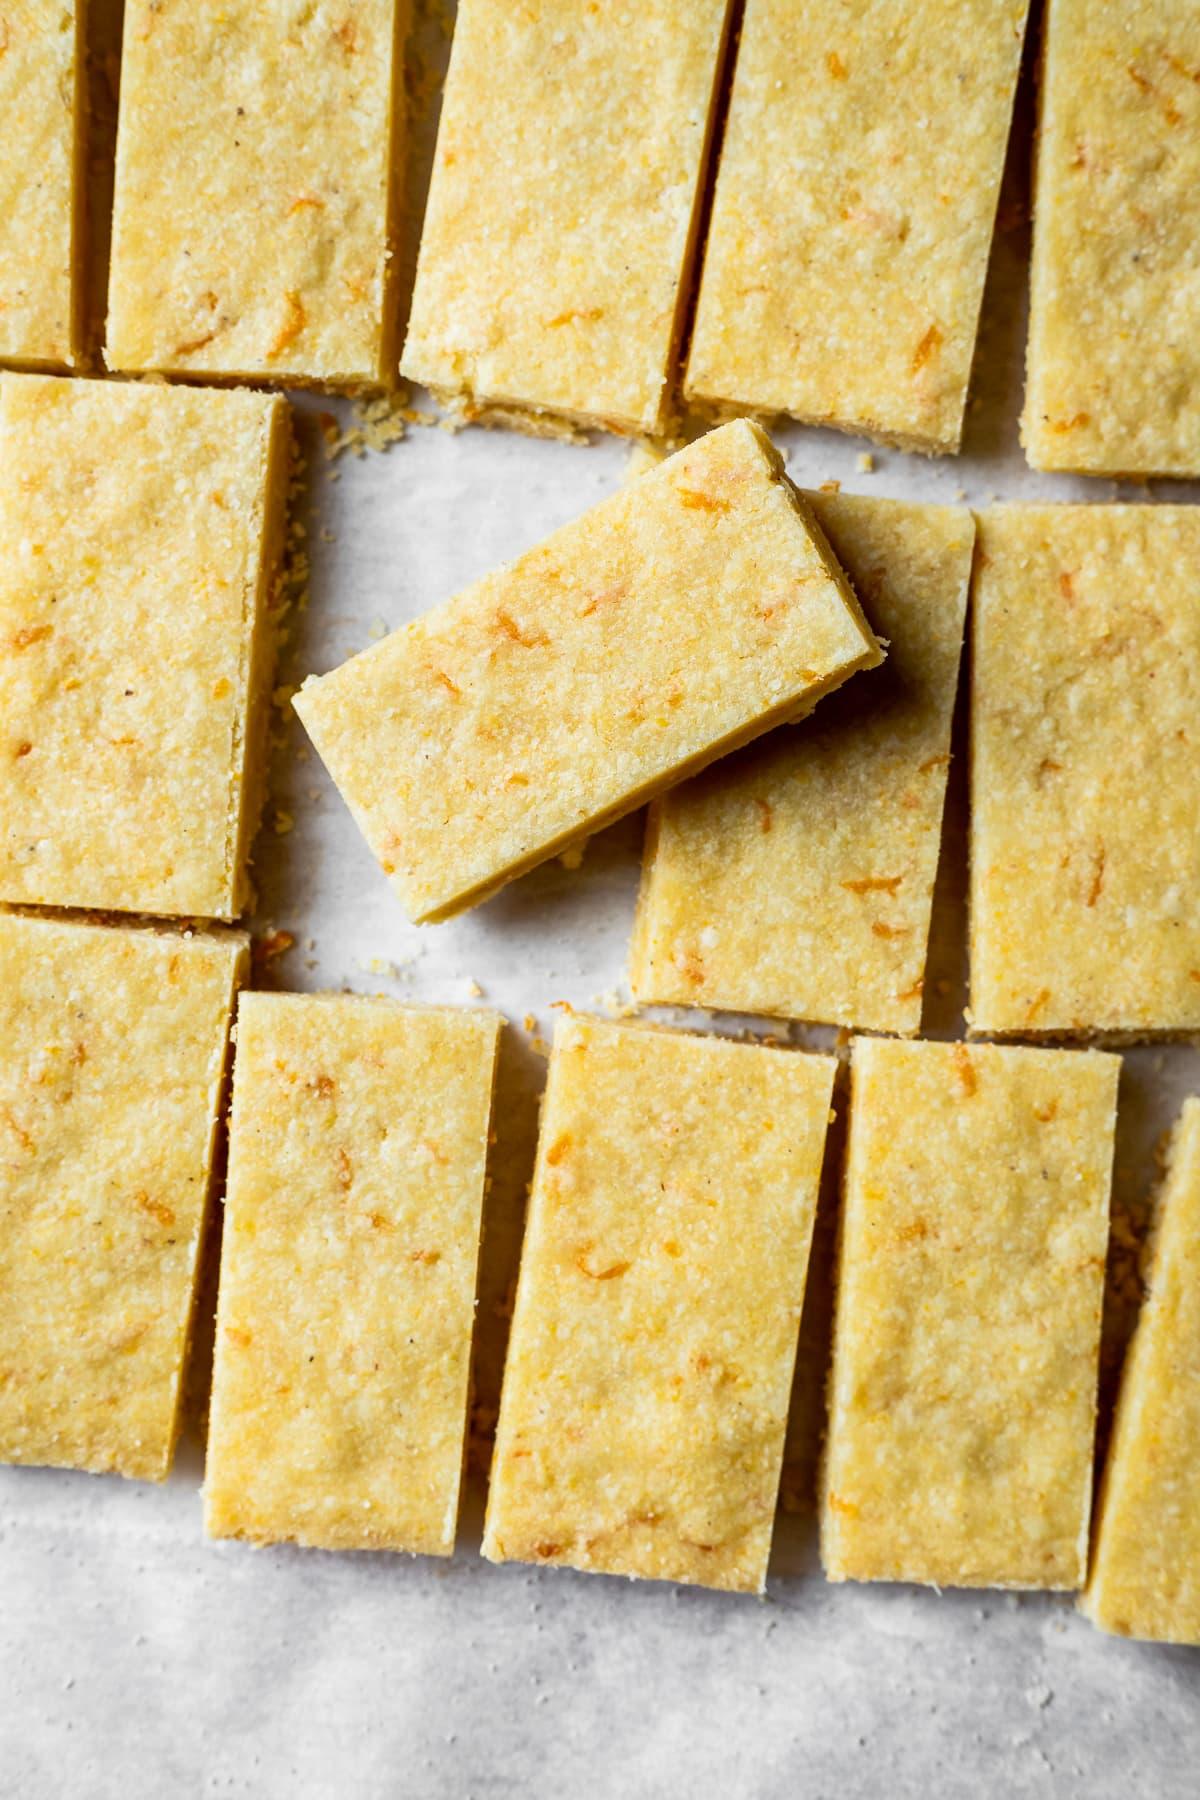 Shortbread cookies with orange zest cut into rectangles on white parchment paper